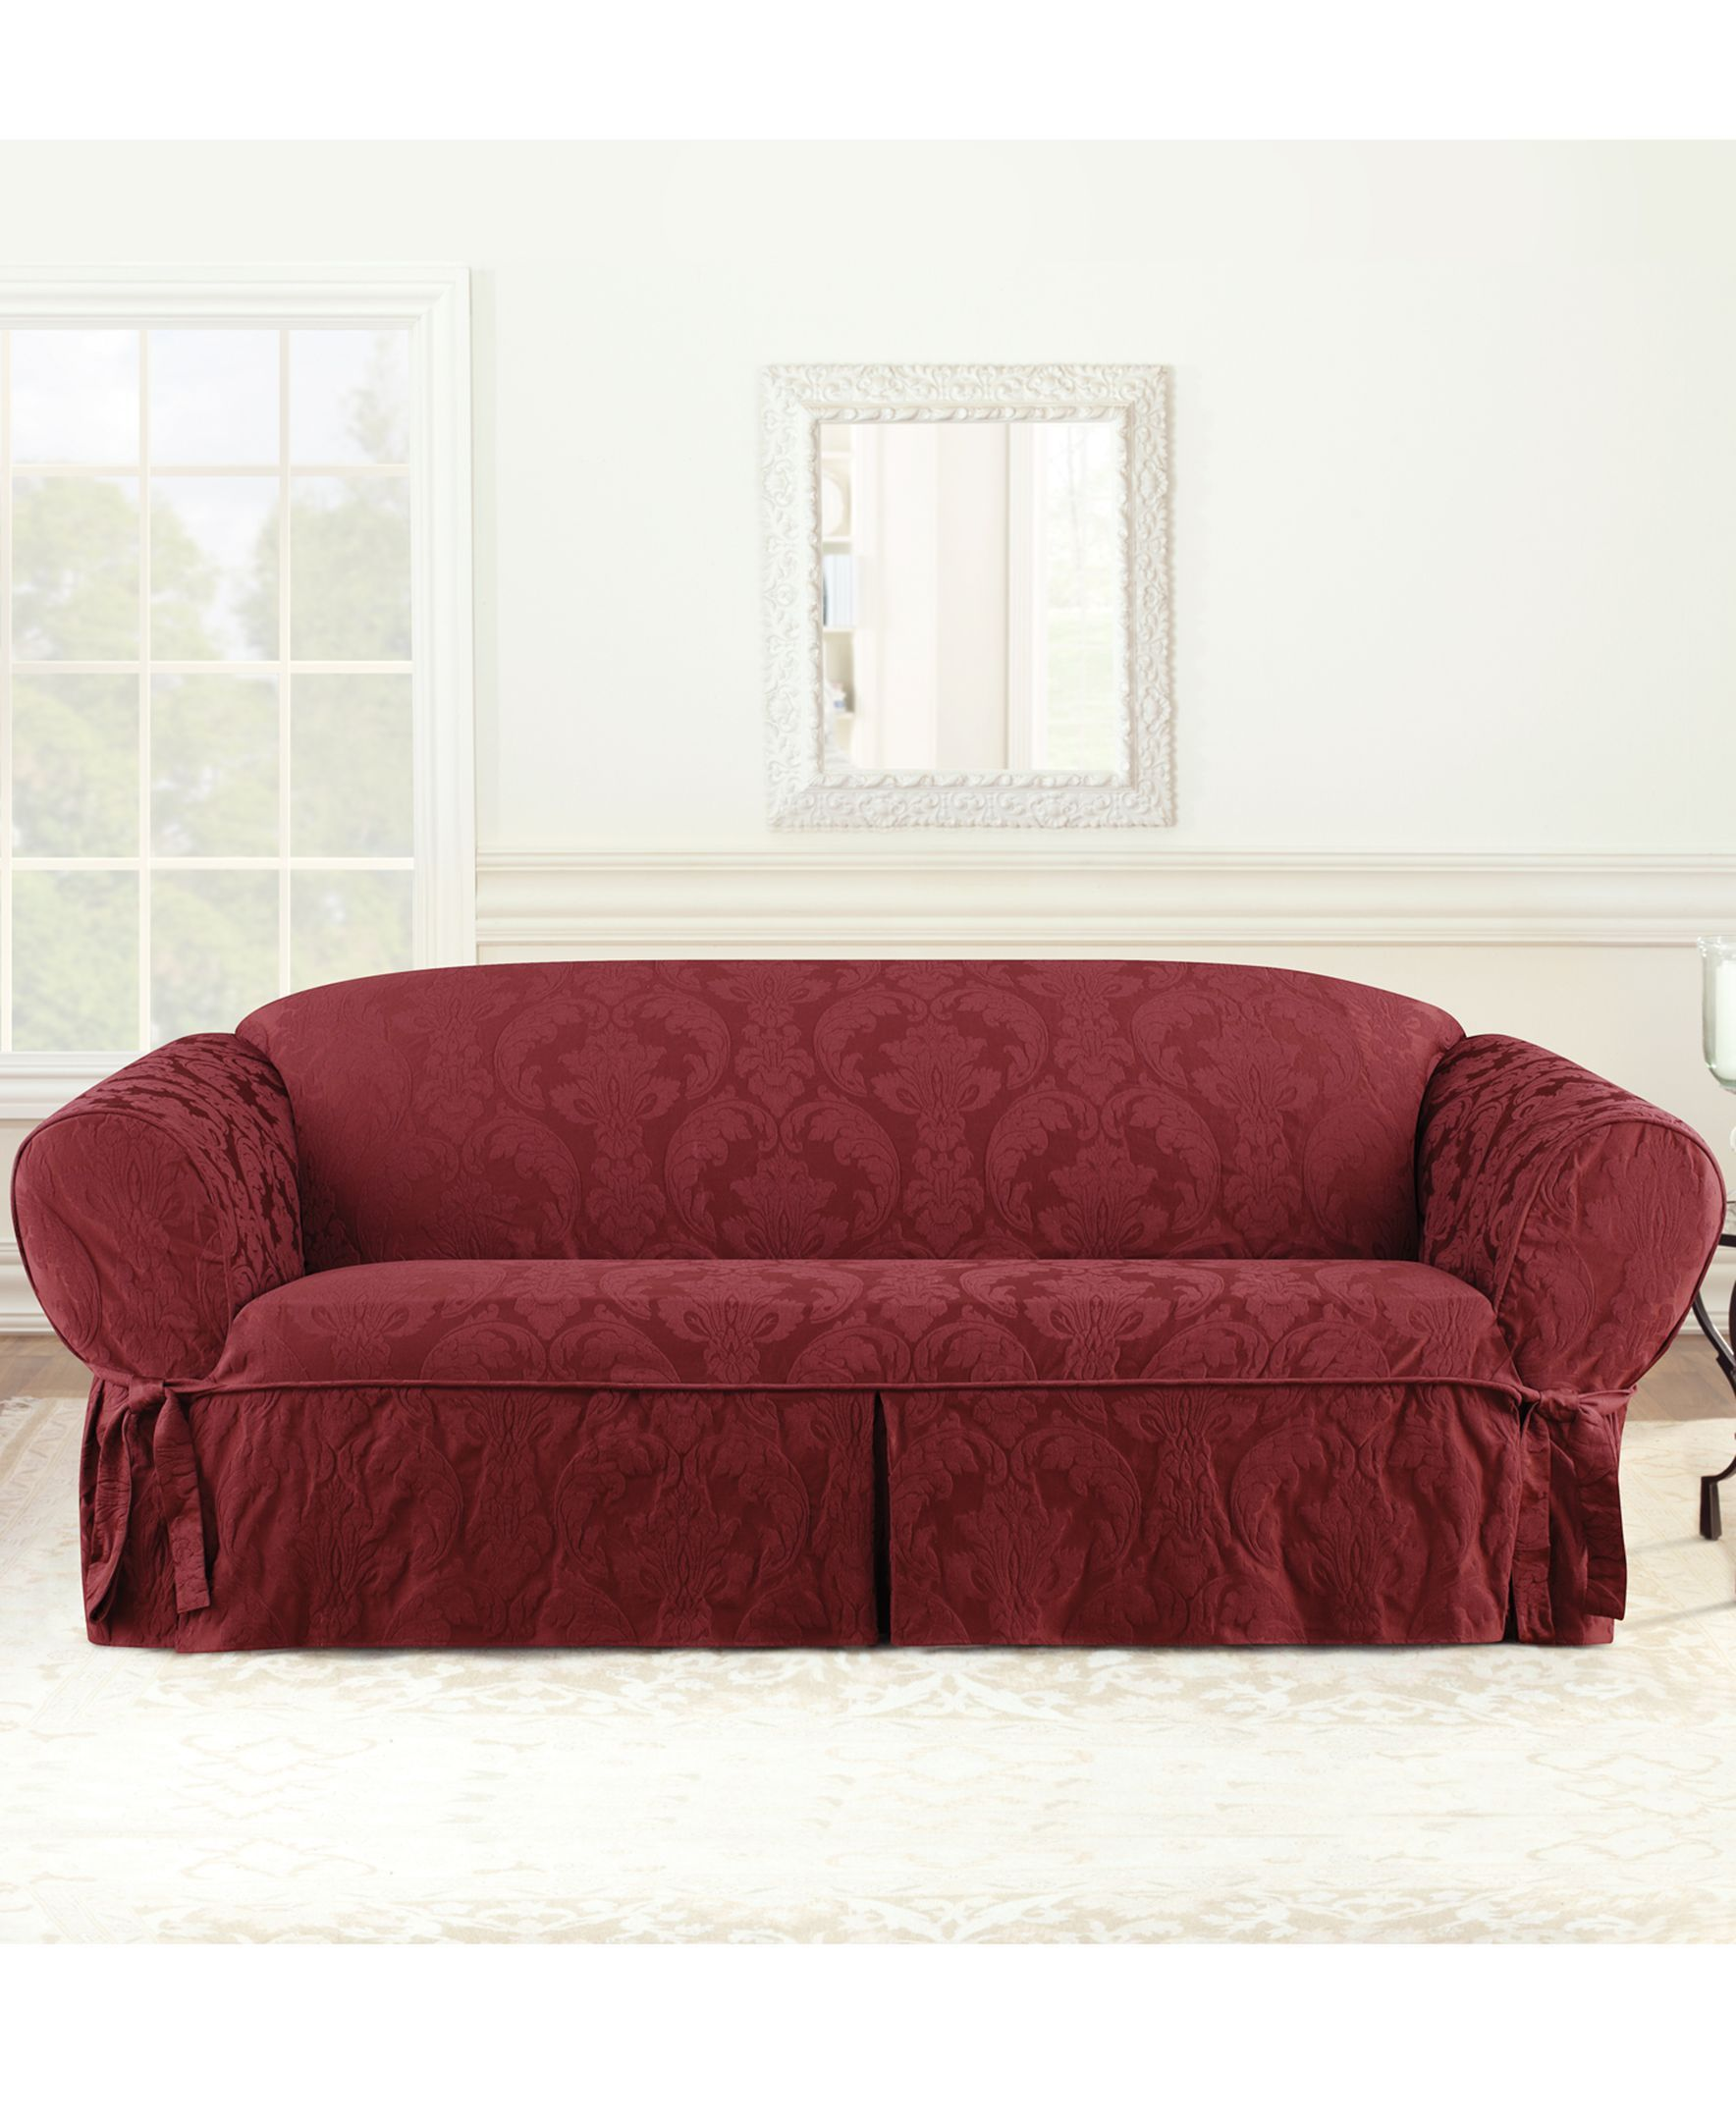 Matelasse Damask 1 Piece Sofa Slipcover Slipcovers Sofa Furniture